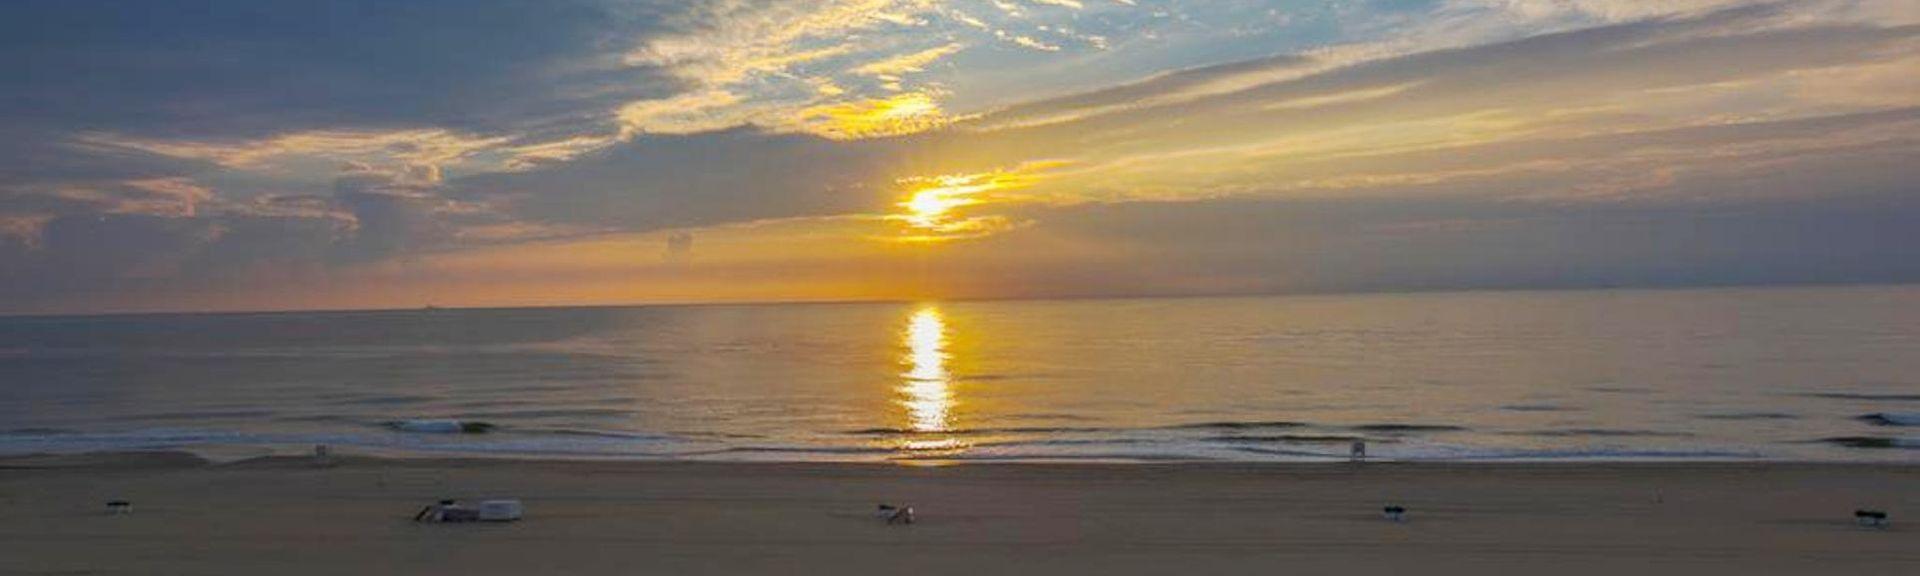 Sandbridge Beach, Virginia Beach, Virginie, États-Unis d'Amérique